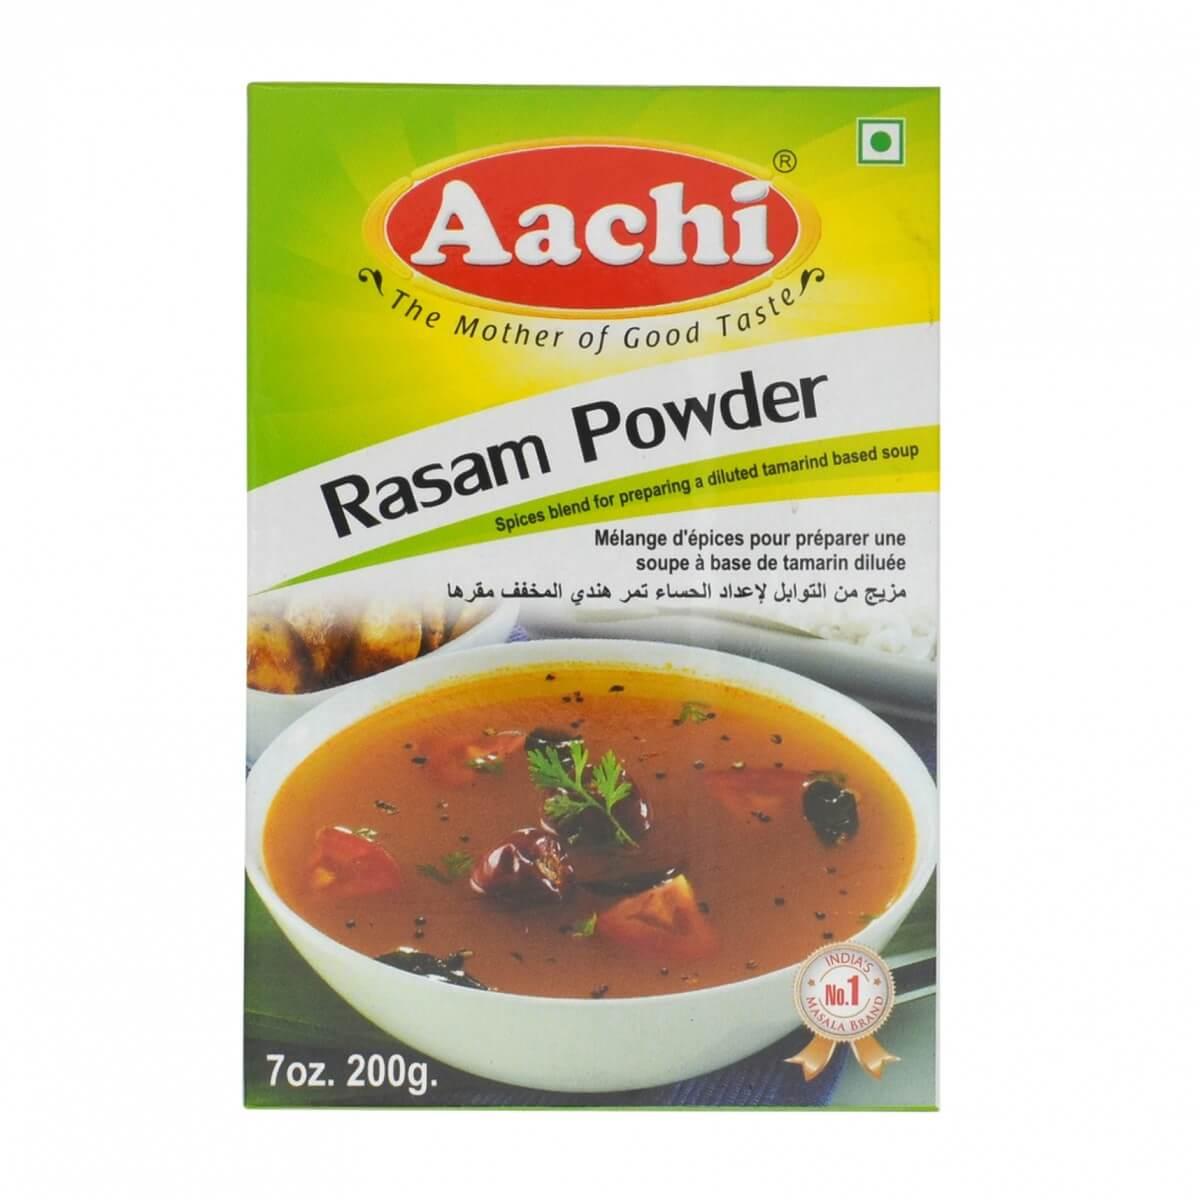 aachi rasam powder 200g front